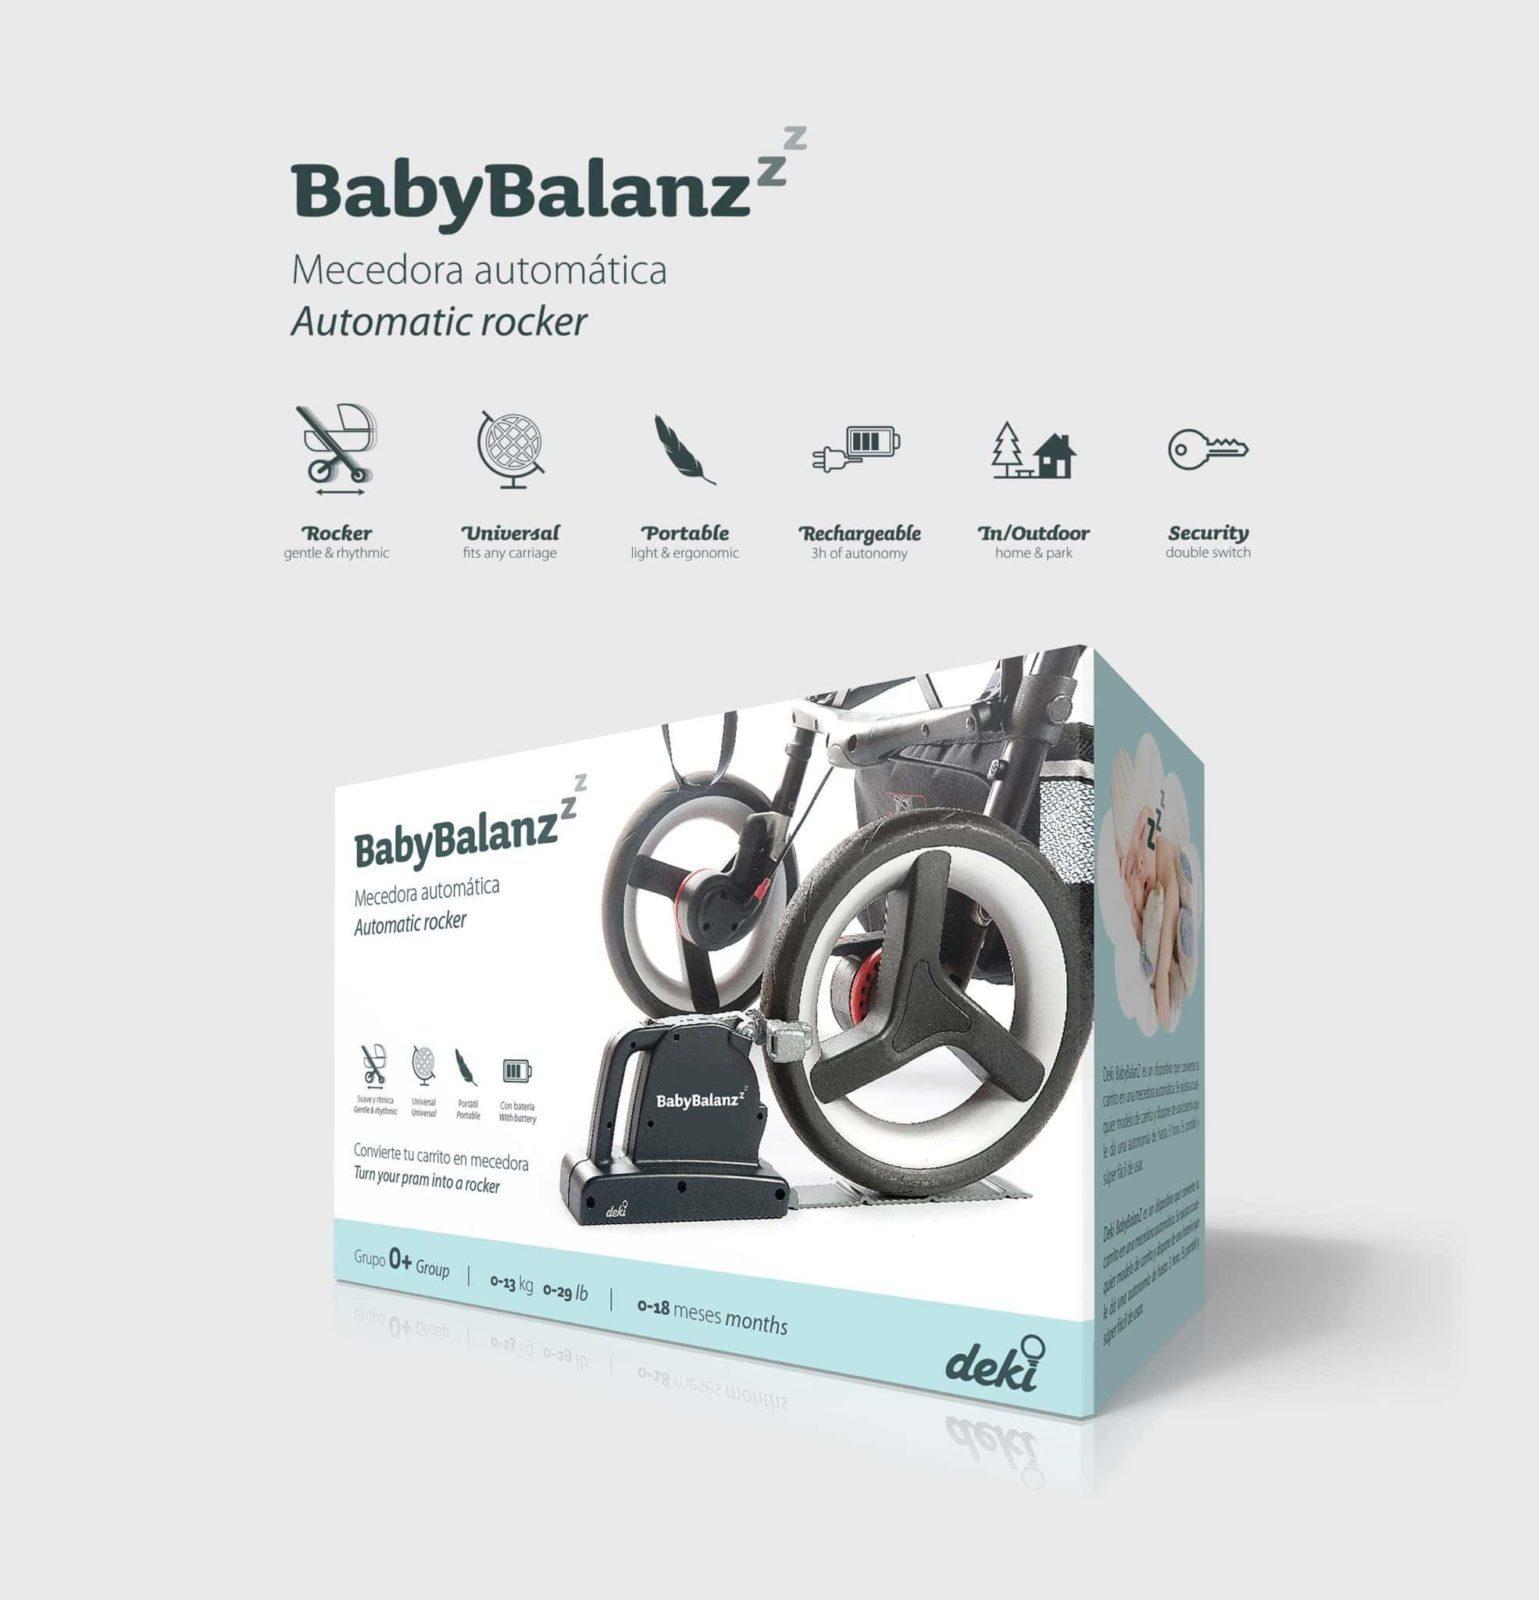 Diseño de packaging BabyBalanz